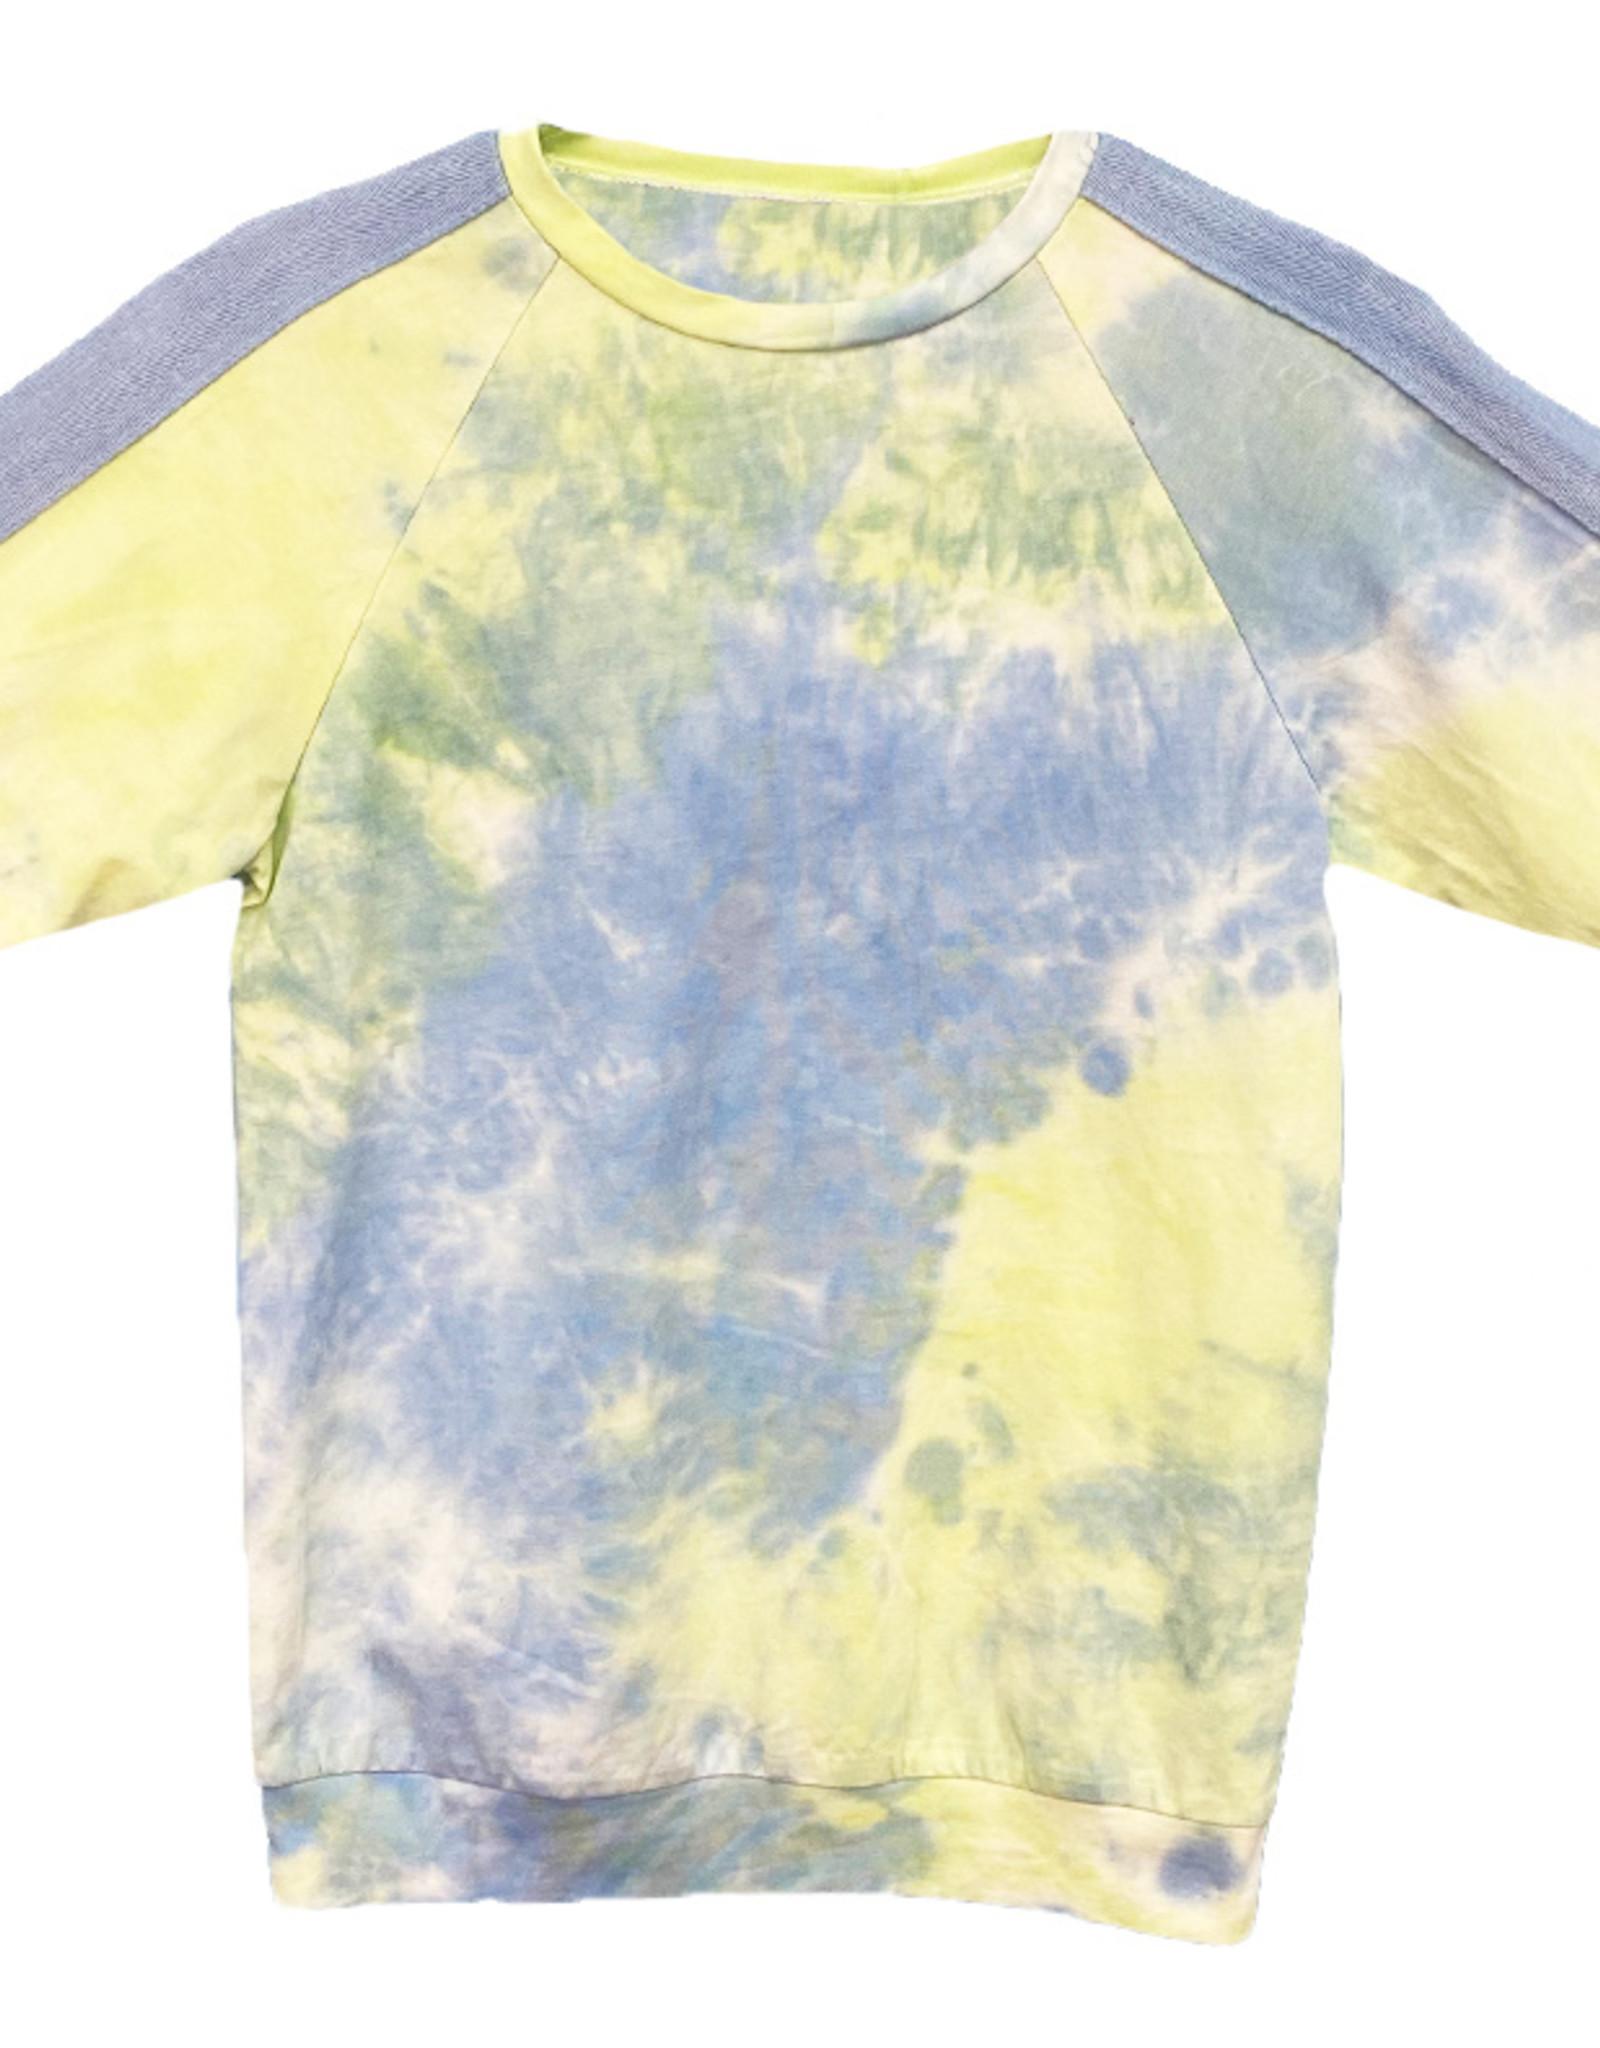 MeMe Basics MeMe Basics Tie Dye Tshirt with Chambray Side Stripes on Sleeves